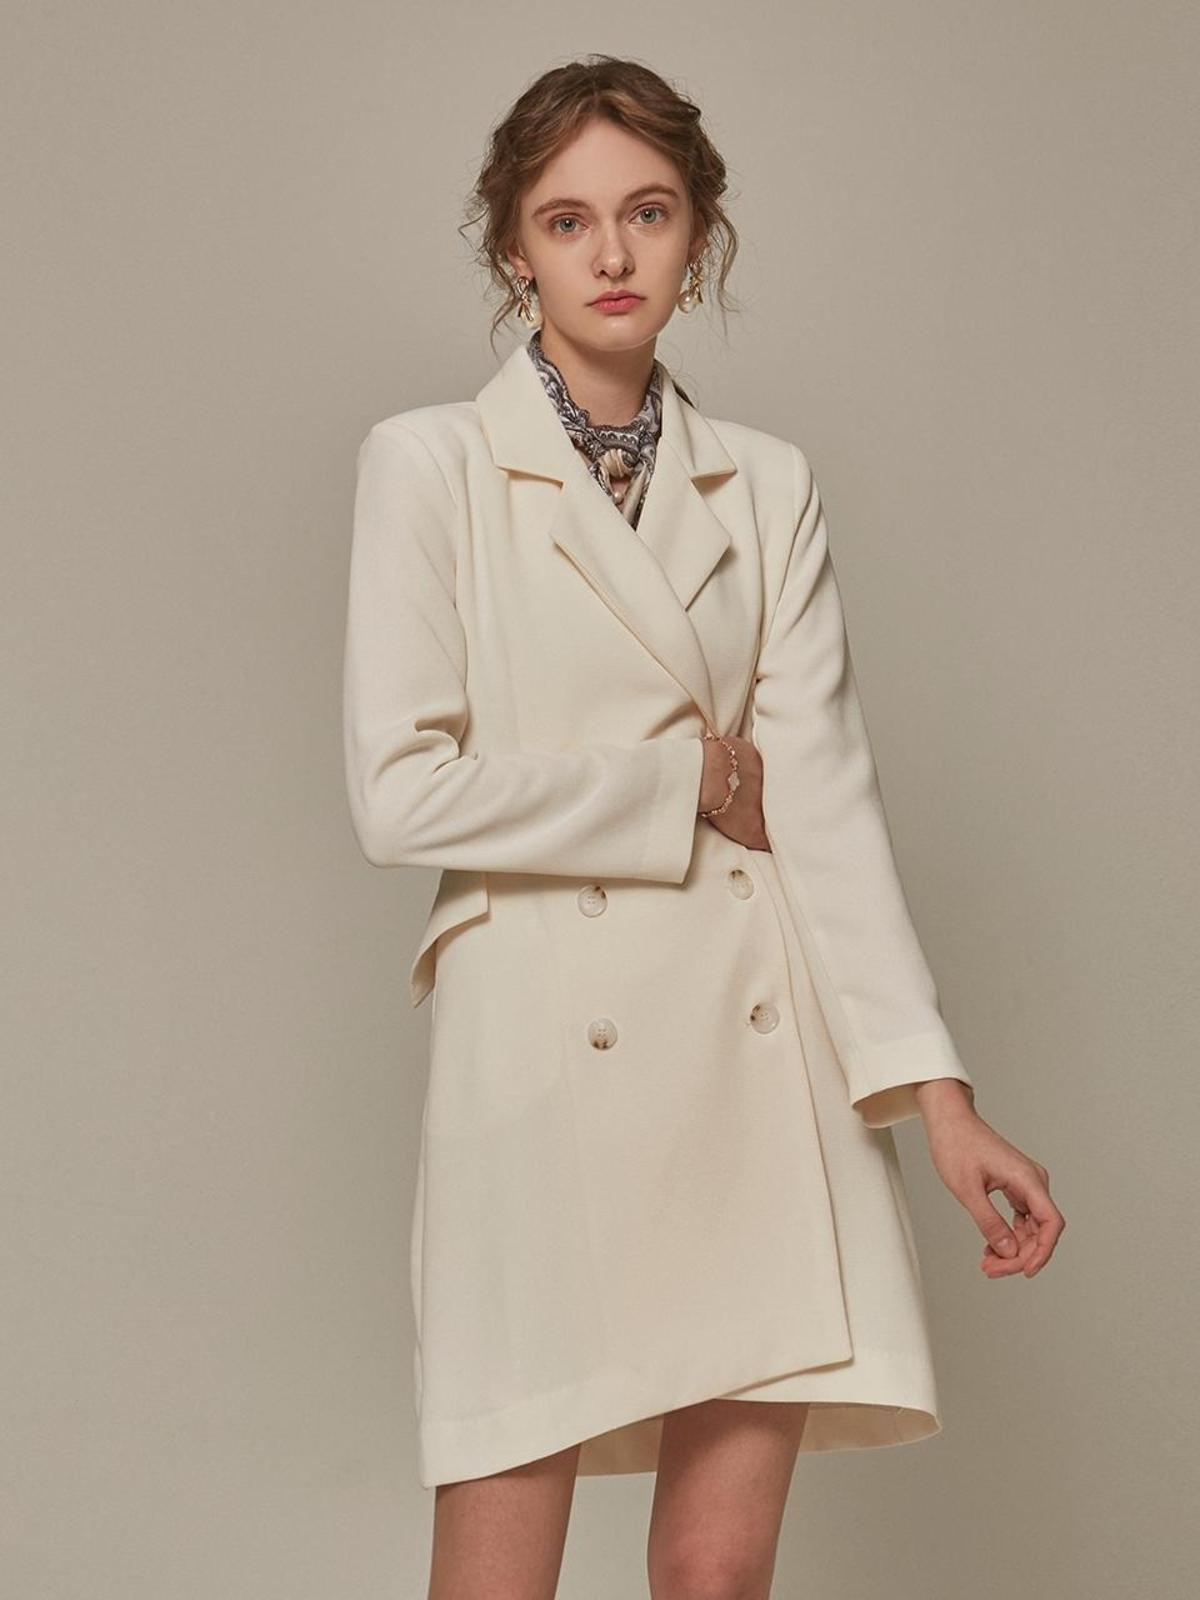 172 Cm 50 Kg yan13|^|double jacket dress ivory on garmentory